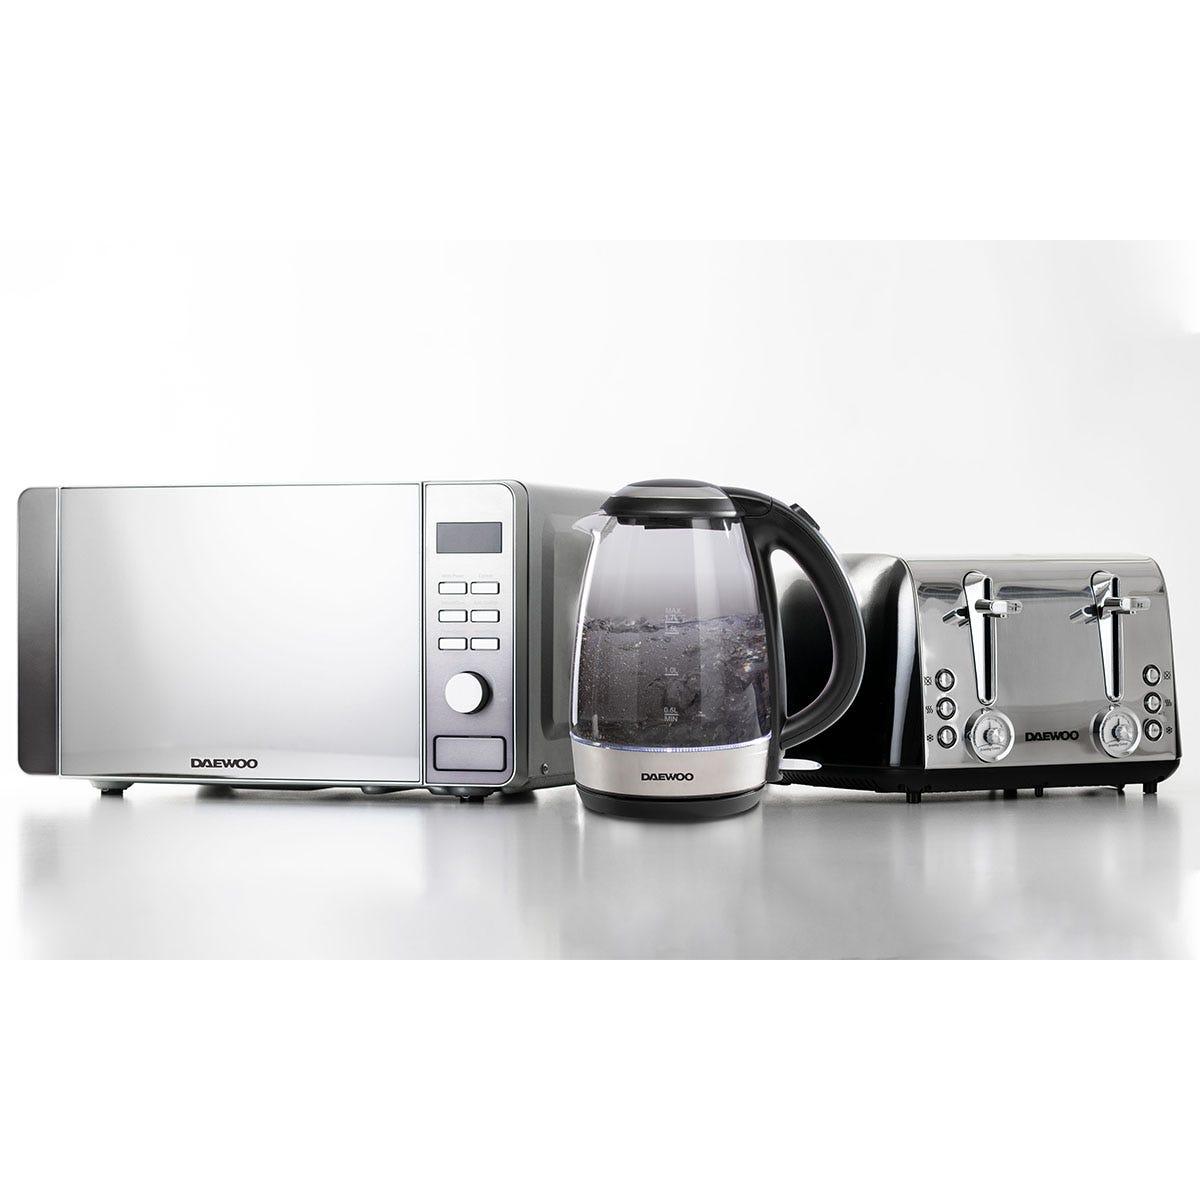 Daewoo Callisto SDA1992GE 1.7L Glass Kettle, Callisto SDA1839GE Retro 4-Slice Toaster, and Callisto SDA1873GE 20L Microwave Bundle - Silver